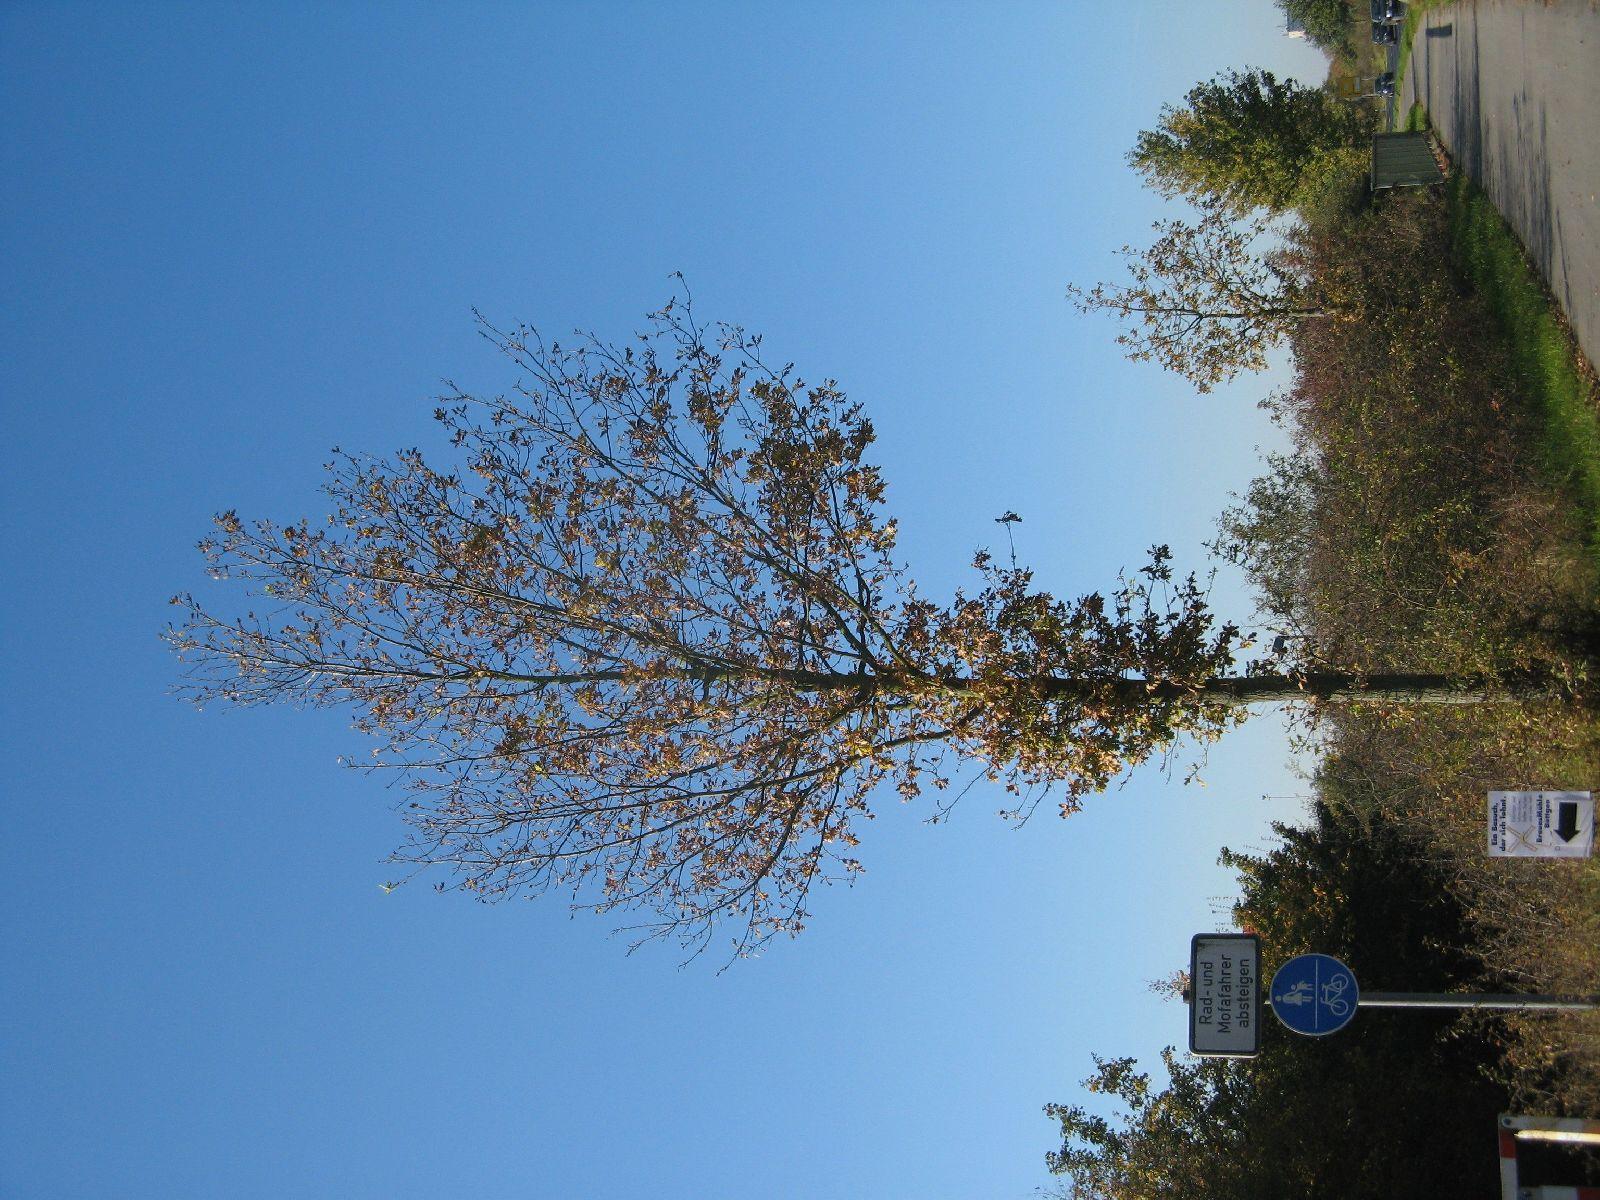 Plants-Trees_Photo_Texture_B_3735